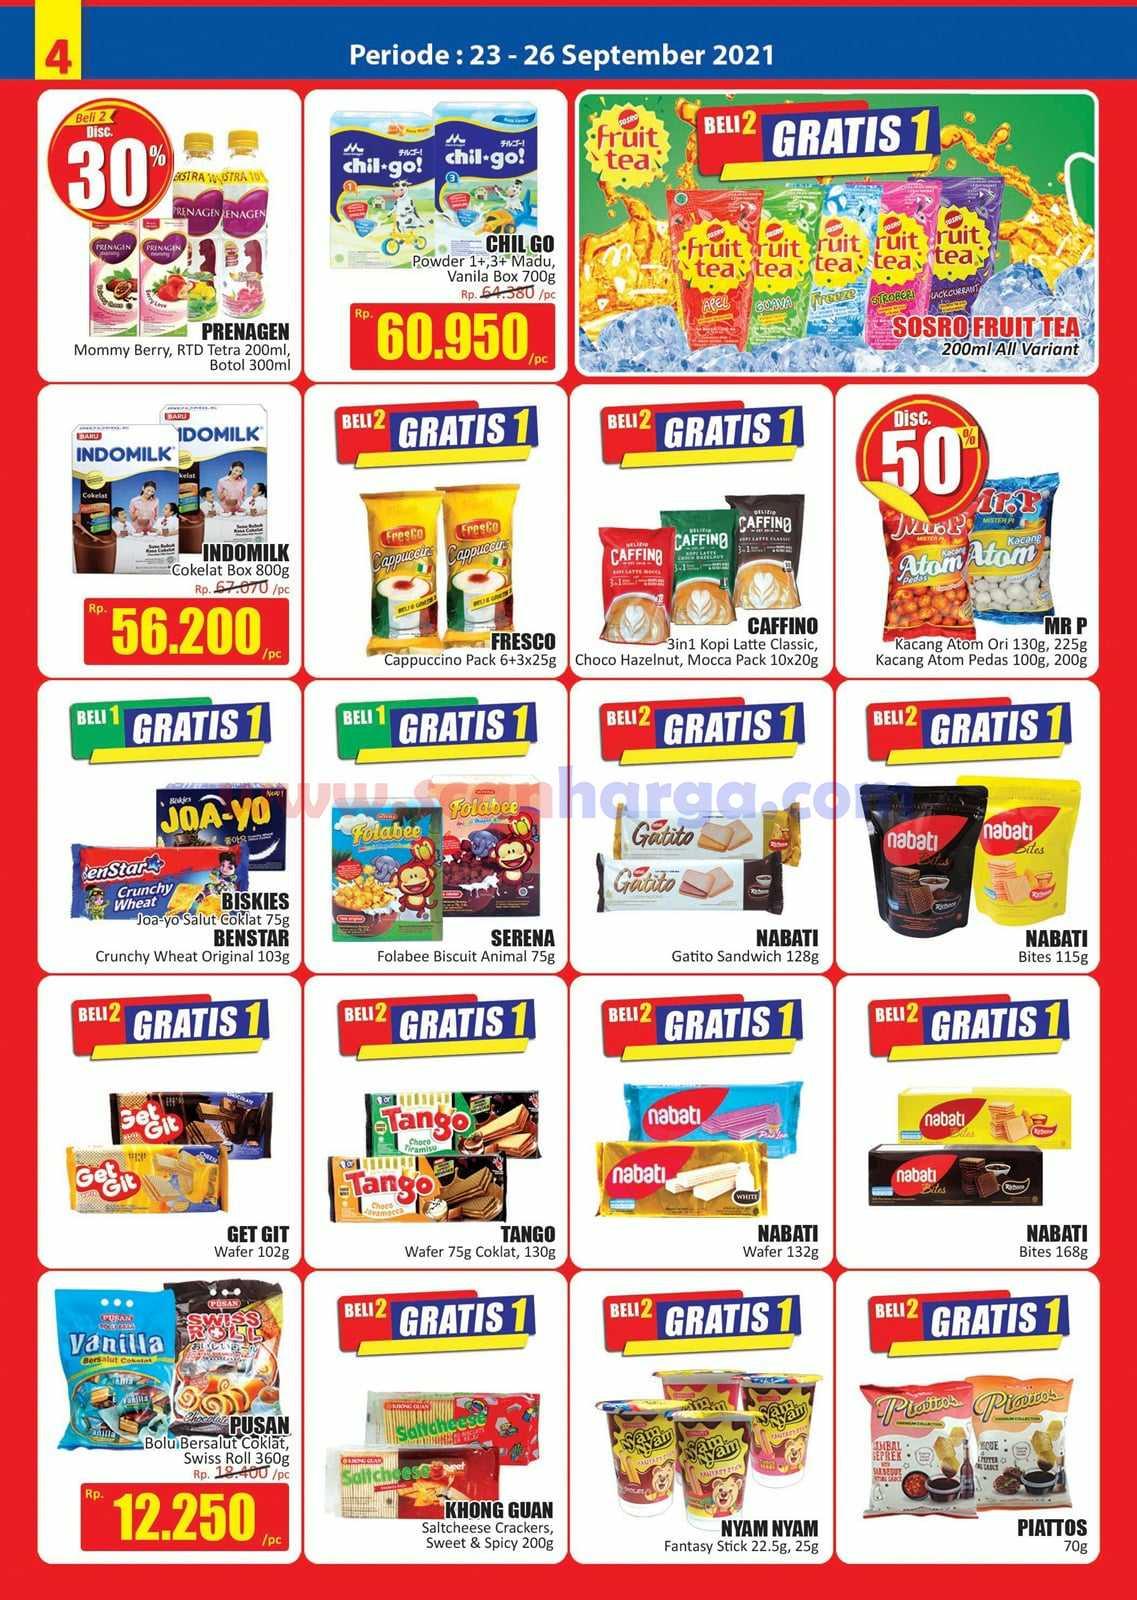 Katalog Promo JSM Hari Hari Swalayan Weekend 23 - 26 September 2021 5